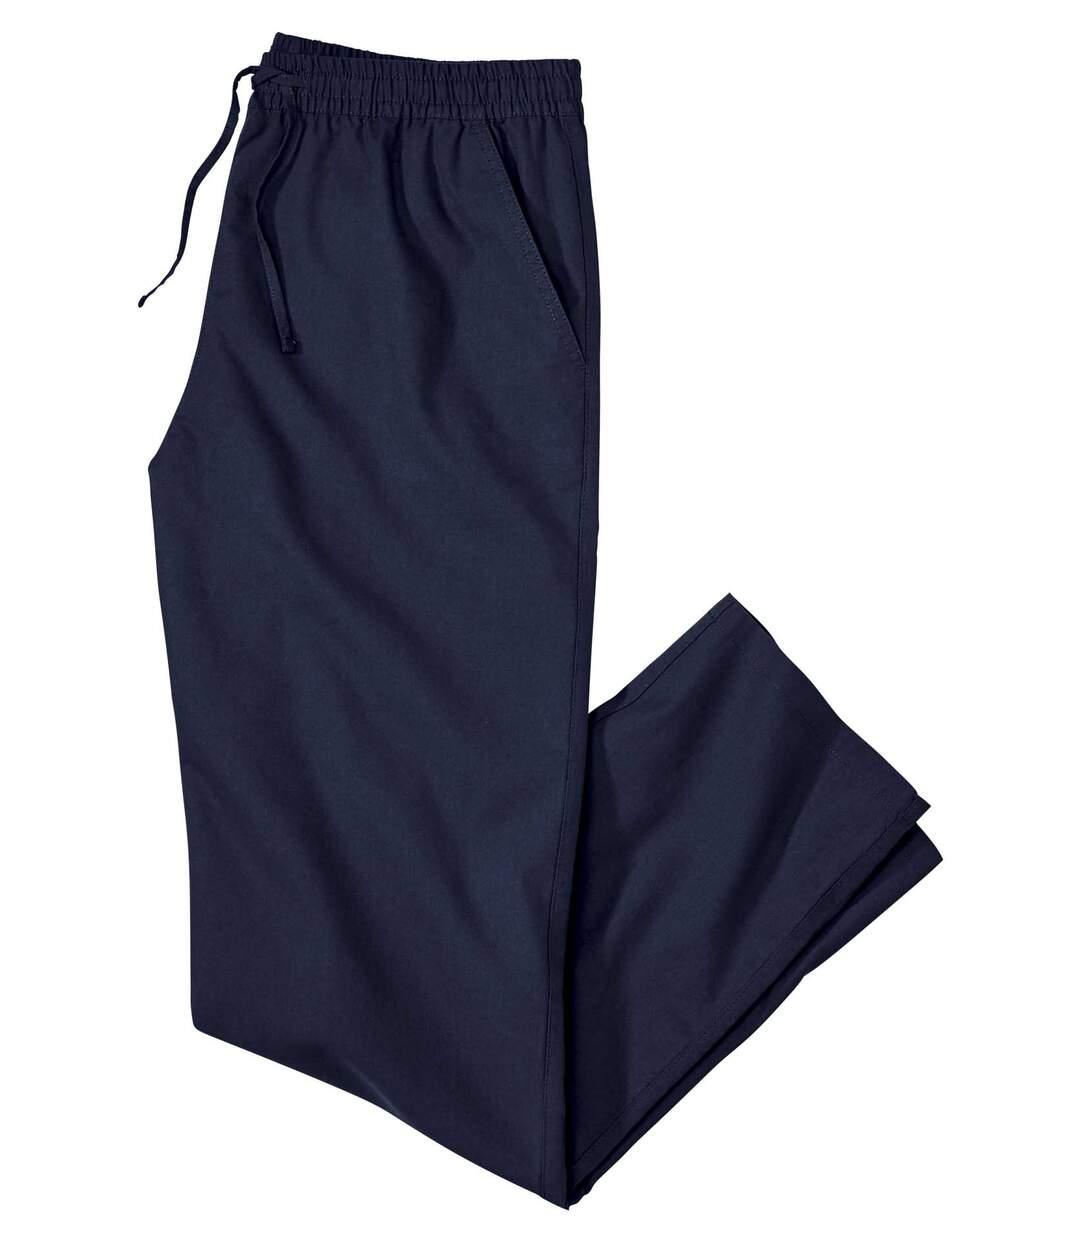 Men's Navy Lounge Trousers